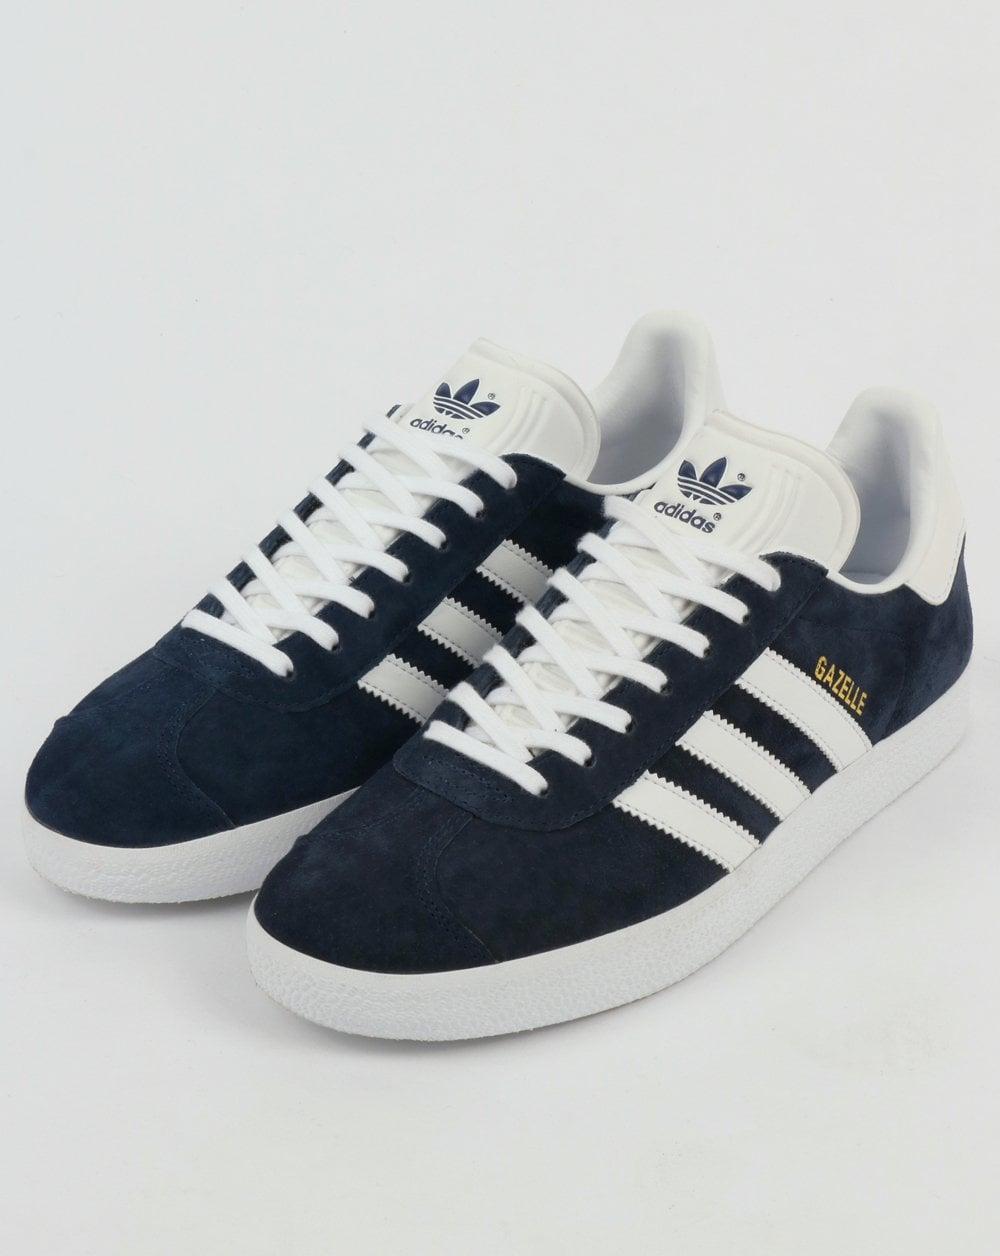 adidas Gazelle 90s navy